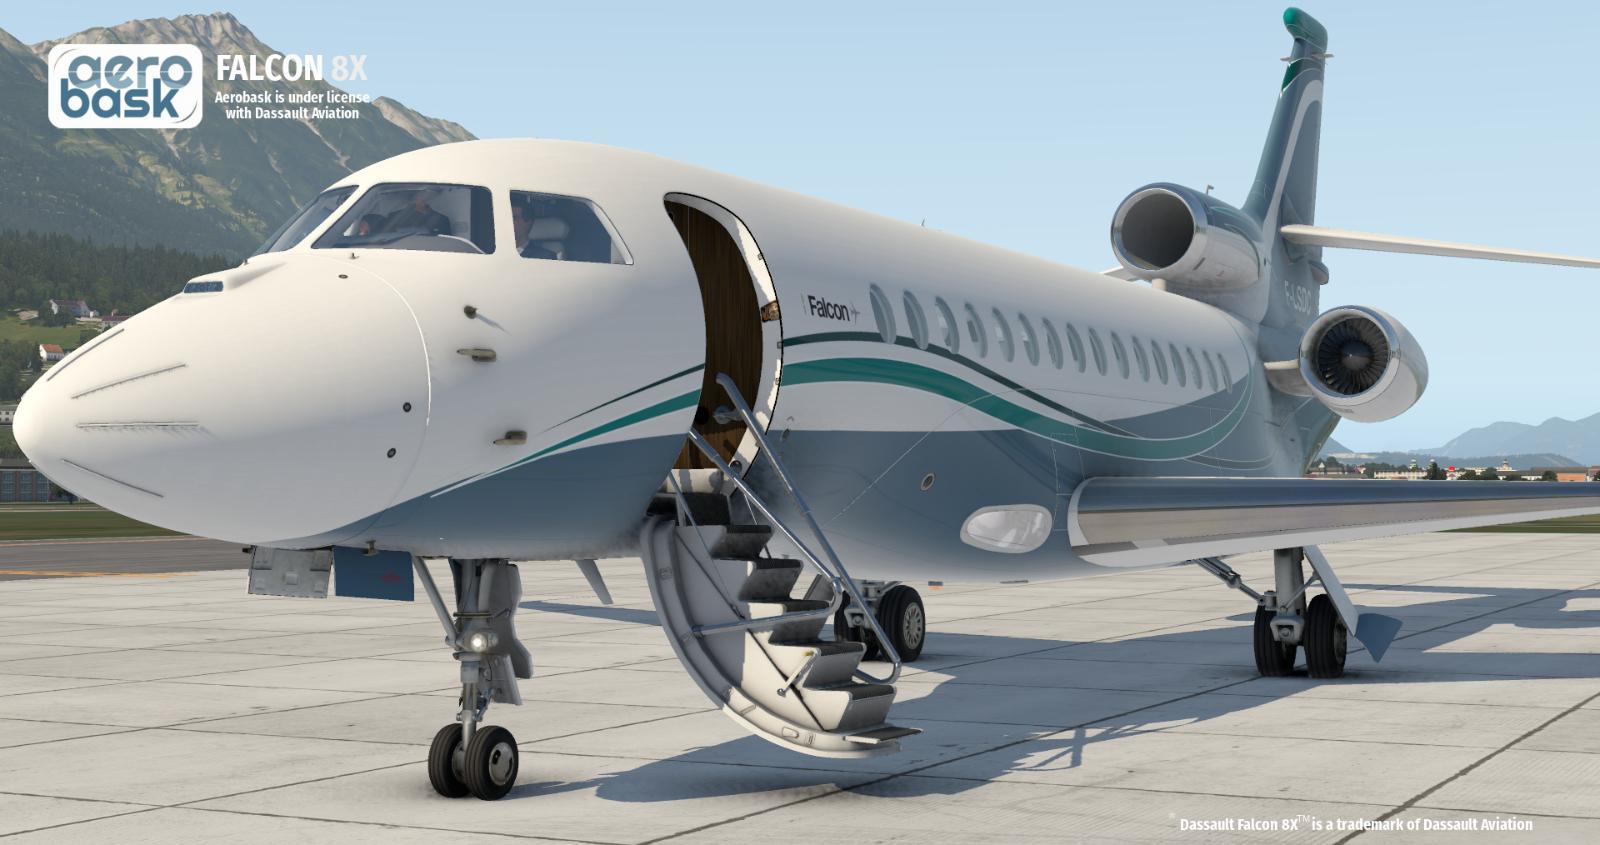 962930262_Aerobask_F8X_6.jpg.b19ba7a61722e778c01212485ee9b910